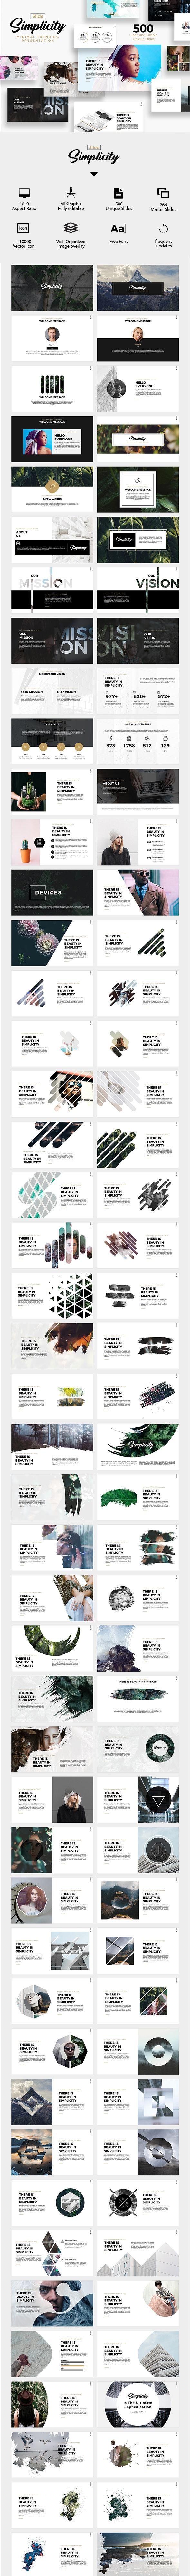 Simplicity Slide Minimal Trending Presentation - Creative PowerPoint Templates